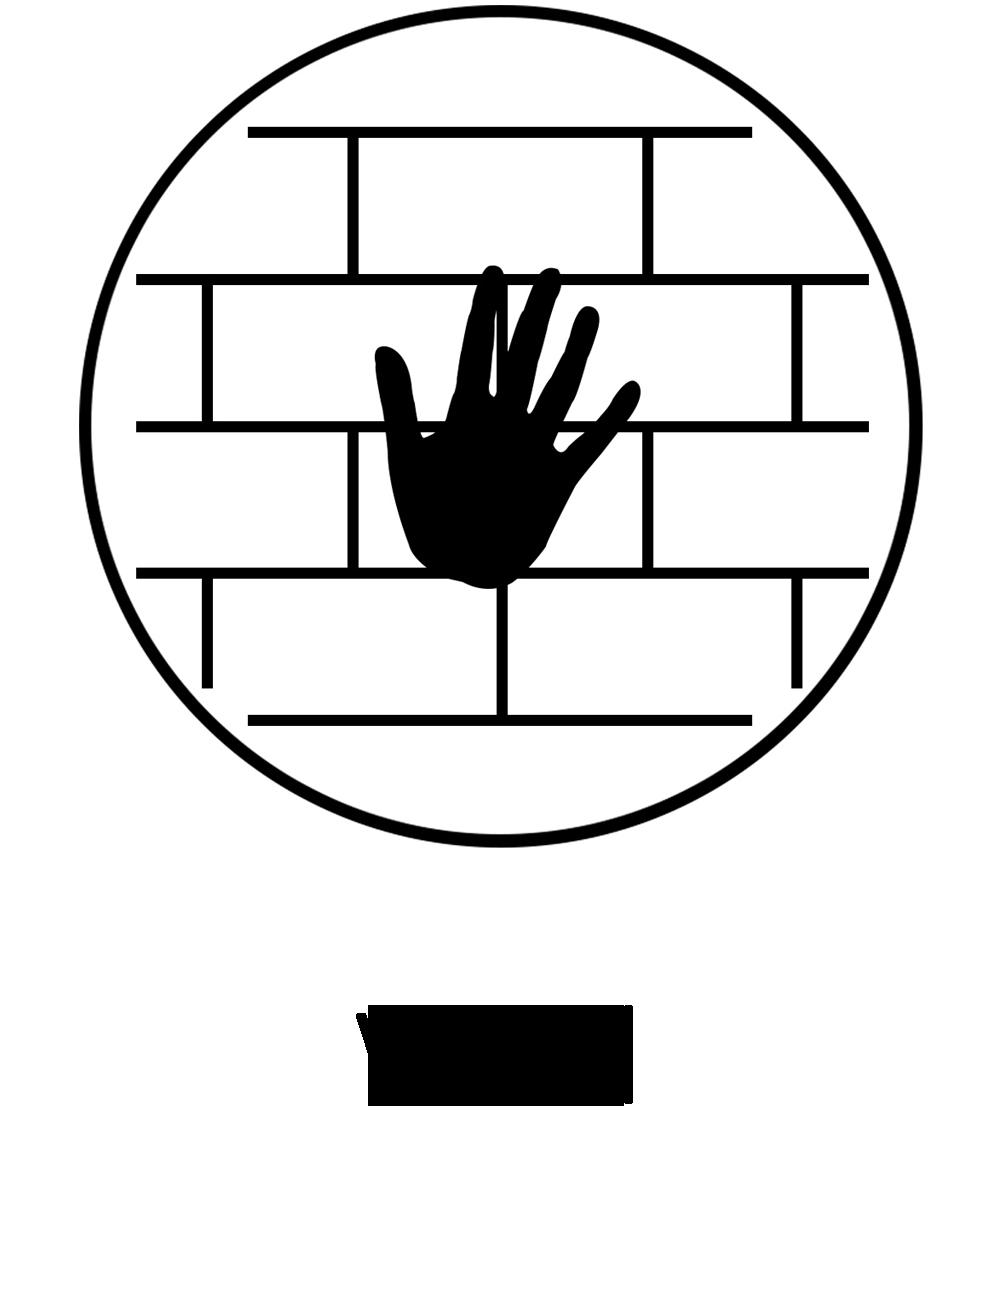 00_Wall.png